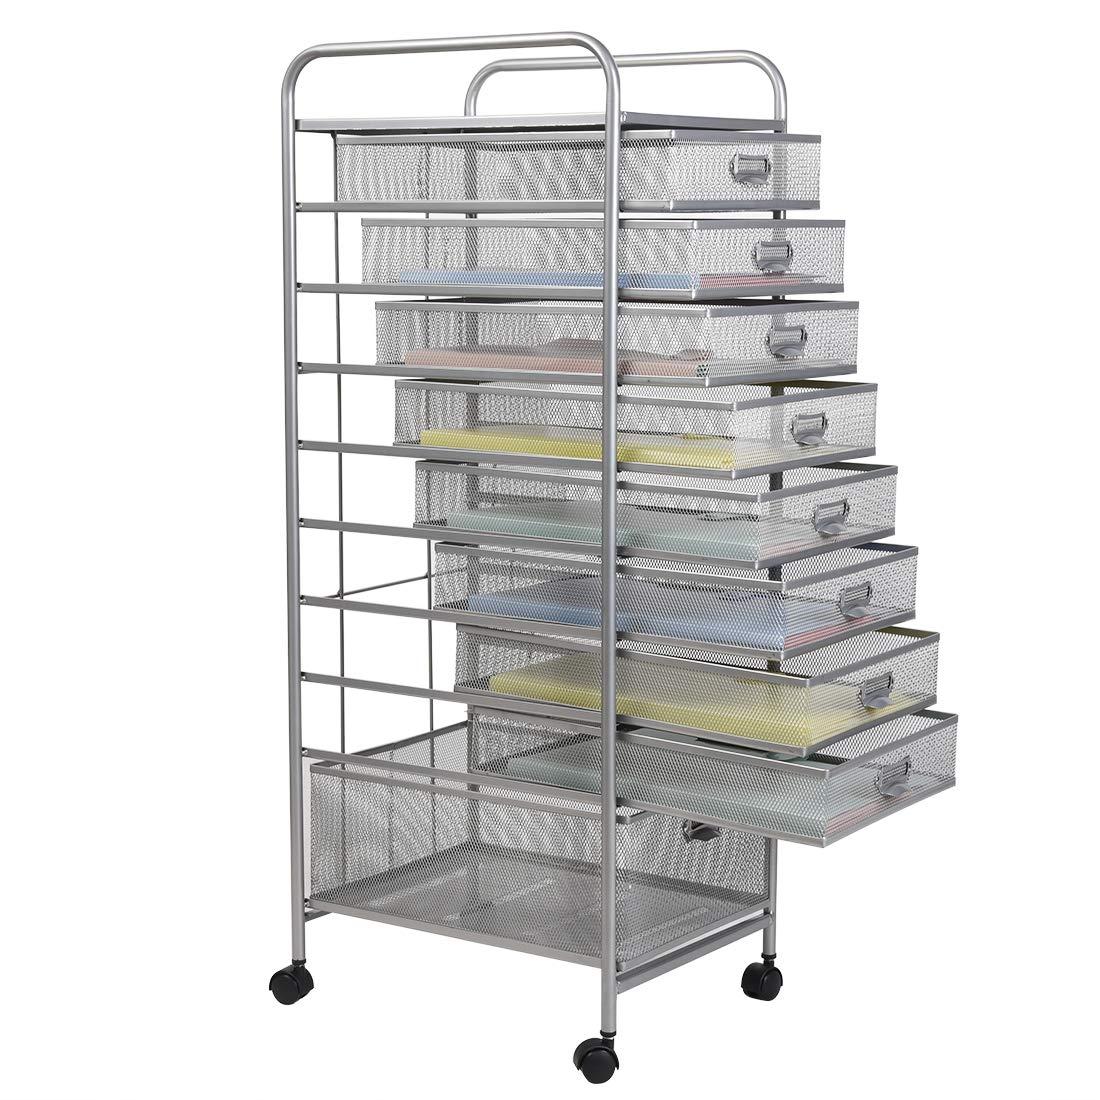 Metal Mesh 9 Drawer Rolling Cart Storage Organizer File Basket Cart Office&Home Cabinet-Silver by sharkbang